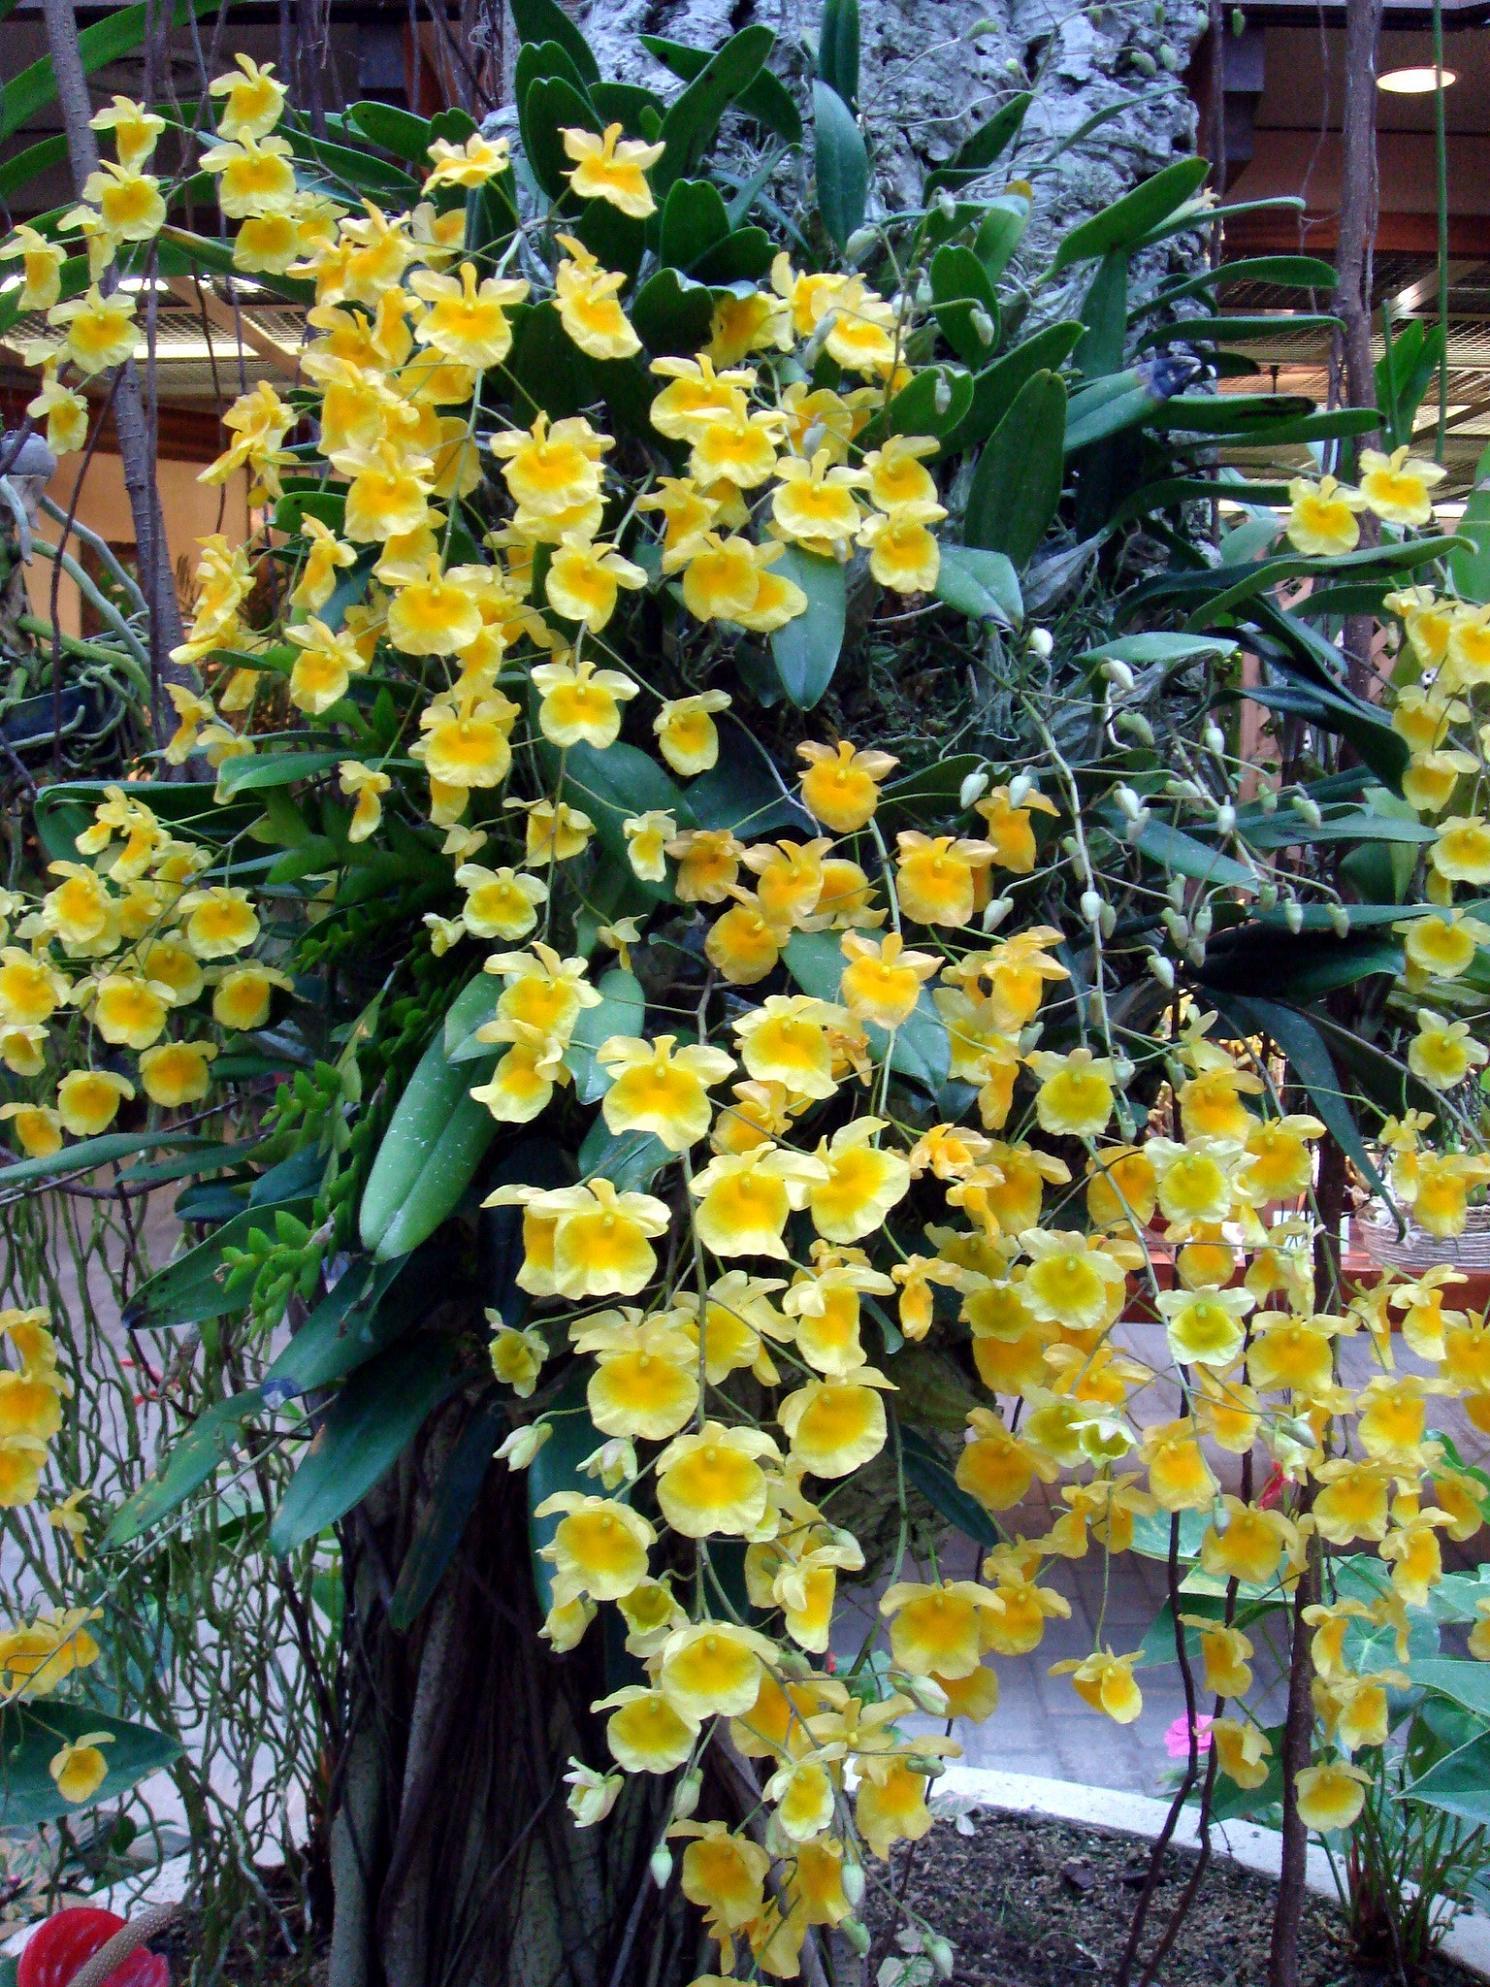 http://orchids.la.coocan.jp/Dendrobium/Dendrobium%20lindleyi/DSC00781.JPG